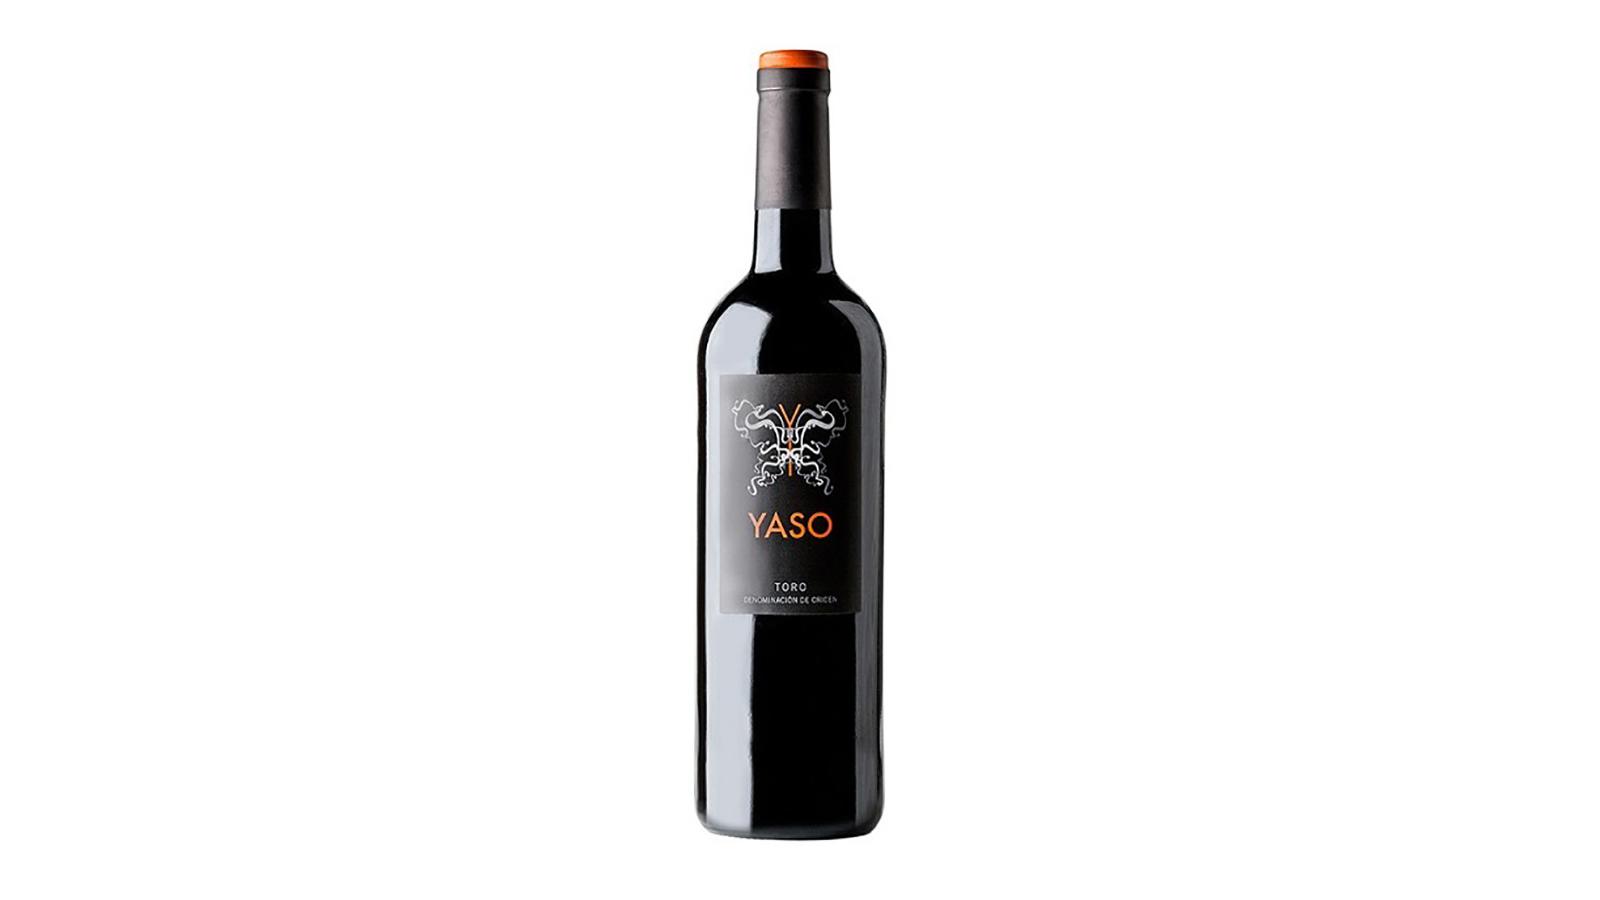 YASO 2014   D.O. TORO‐ 9,50 €